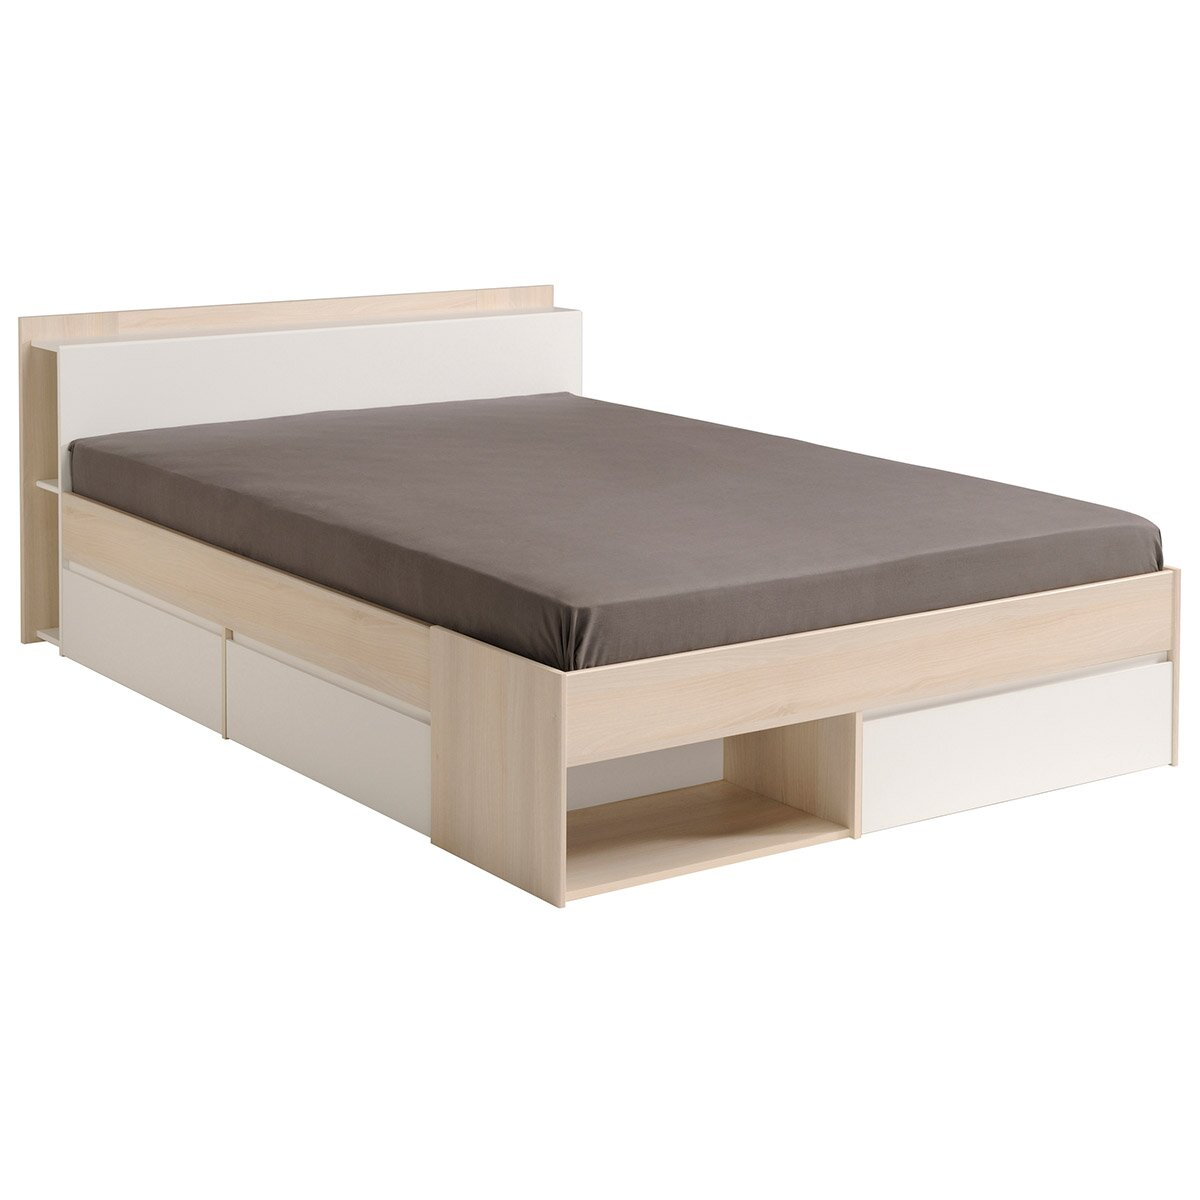 Most storage platform bed reviews allmodern - Seagrass platform bed ...